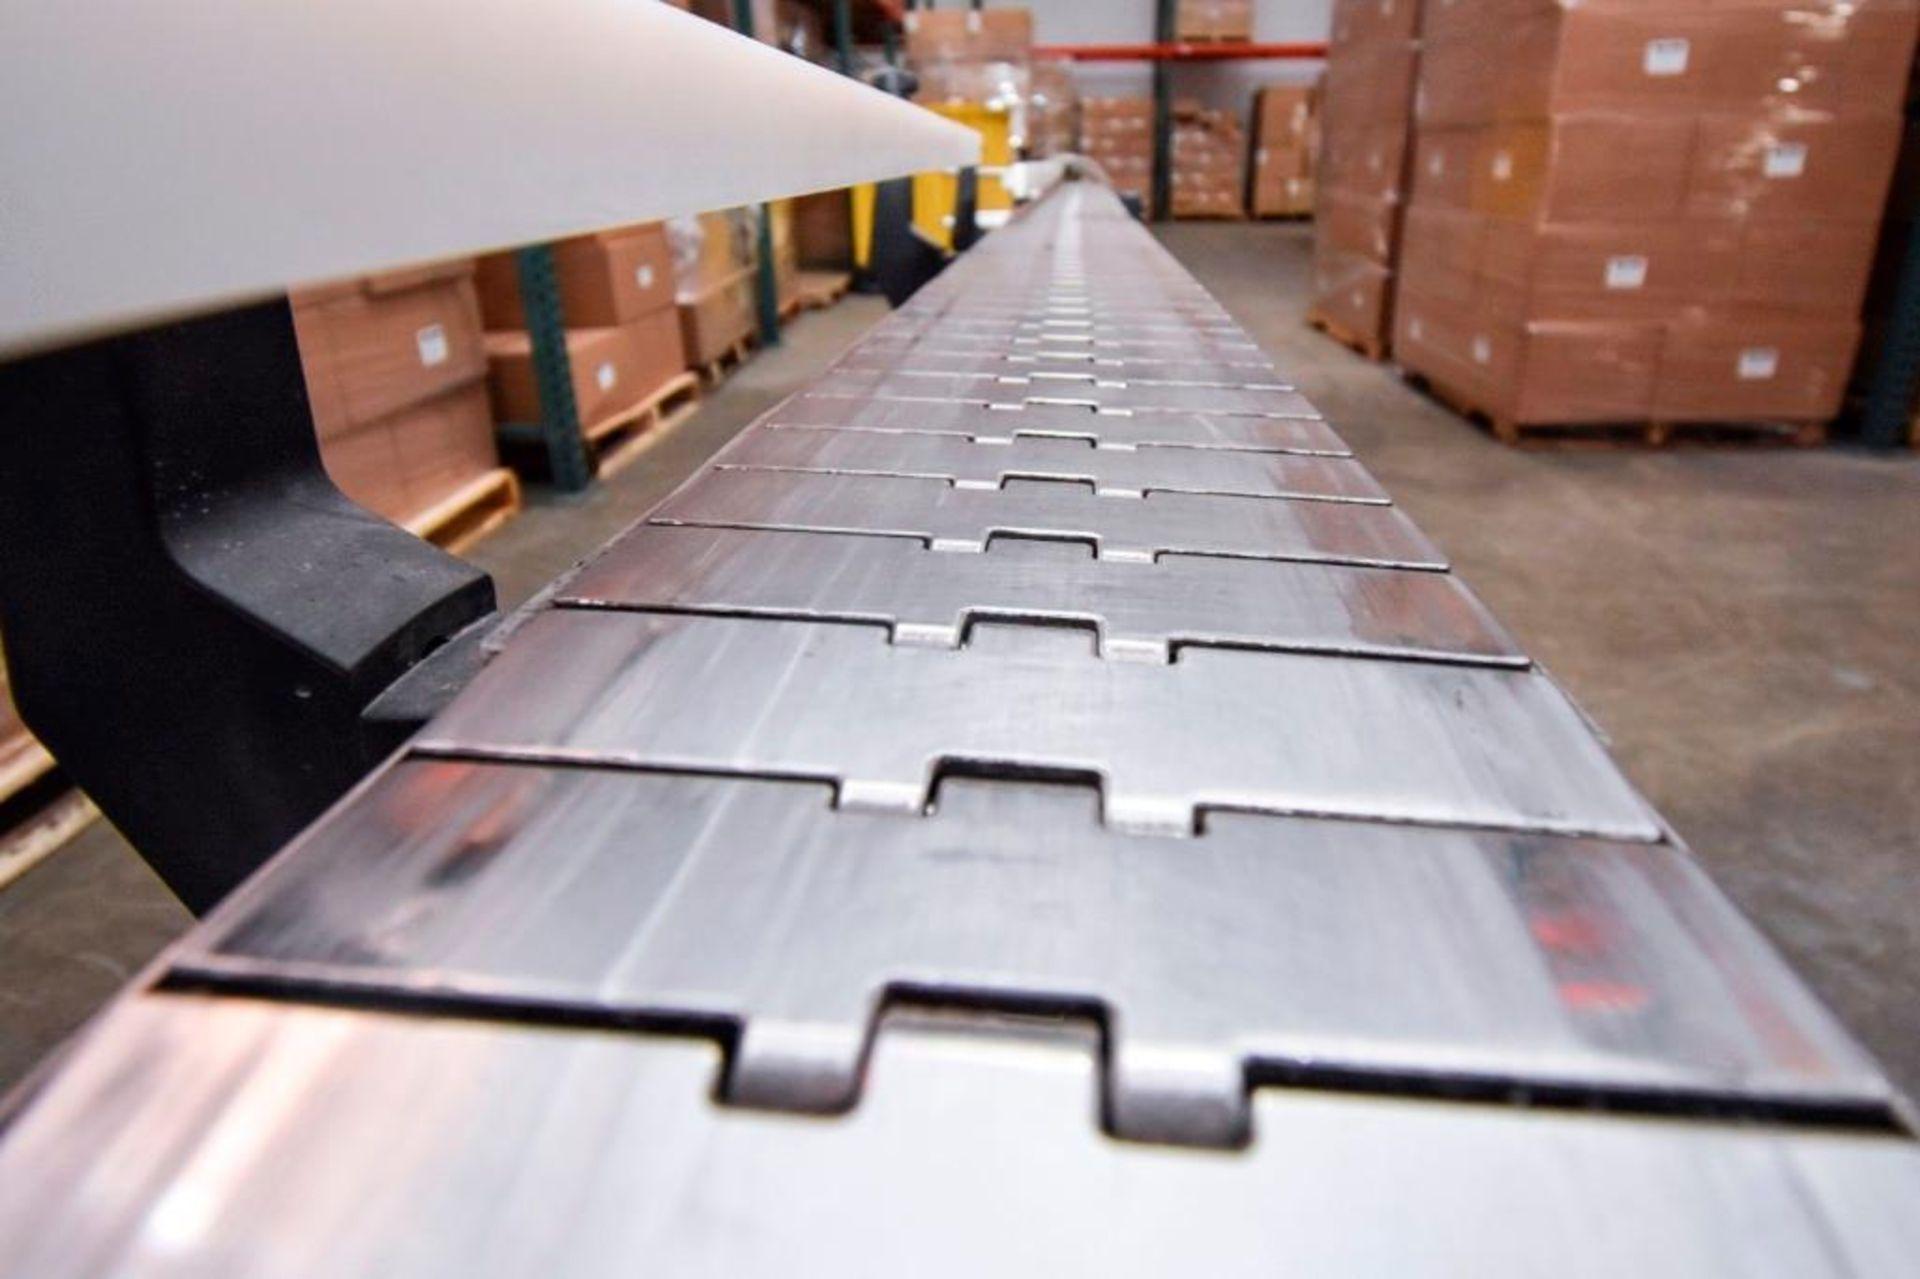 Axon Variable Speed Conveyor - Image 7 of 9